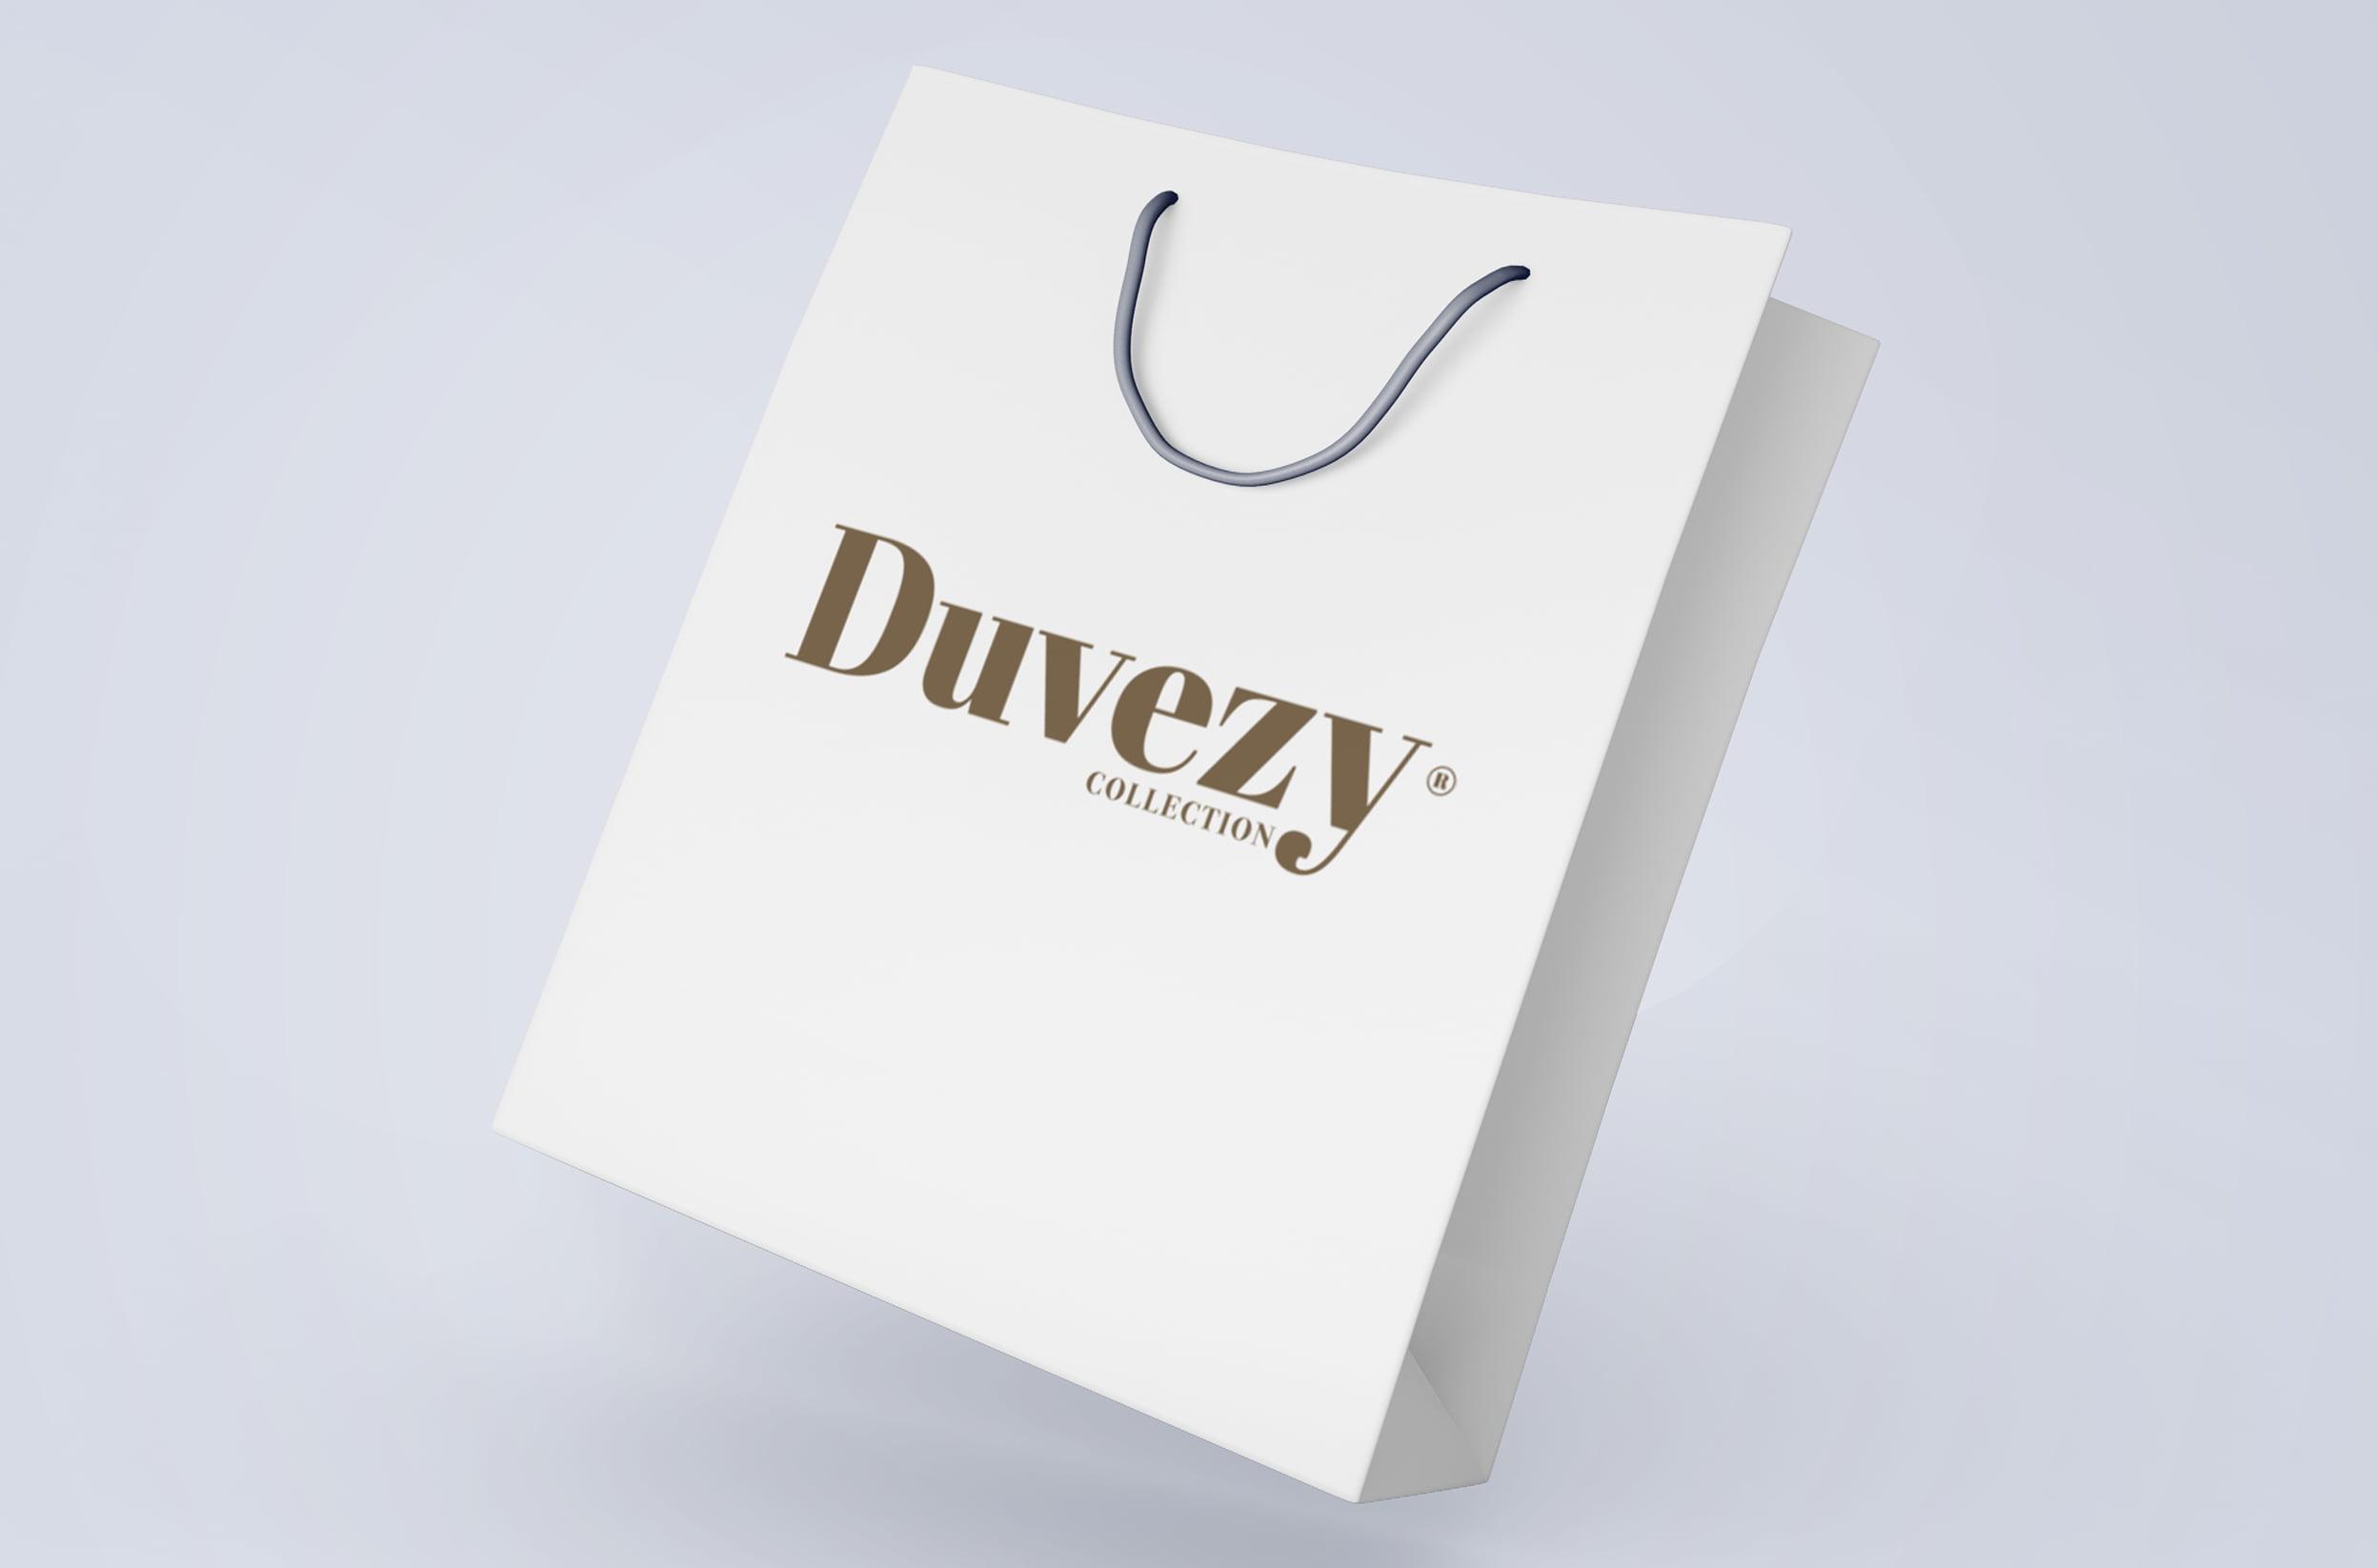 duvezy-6